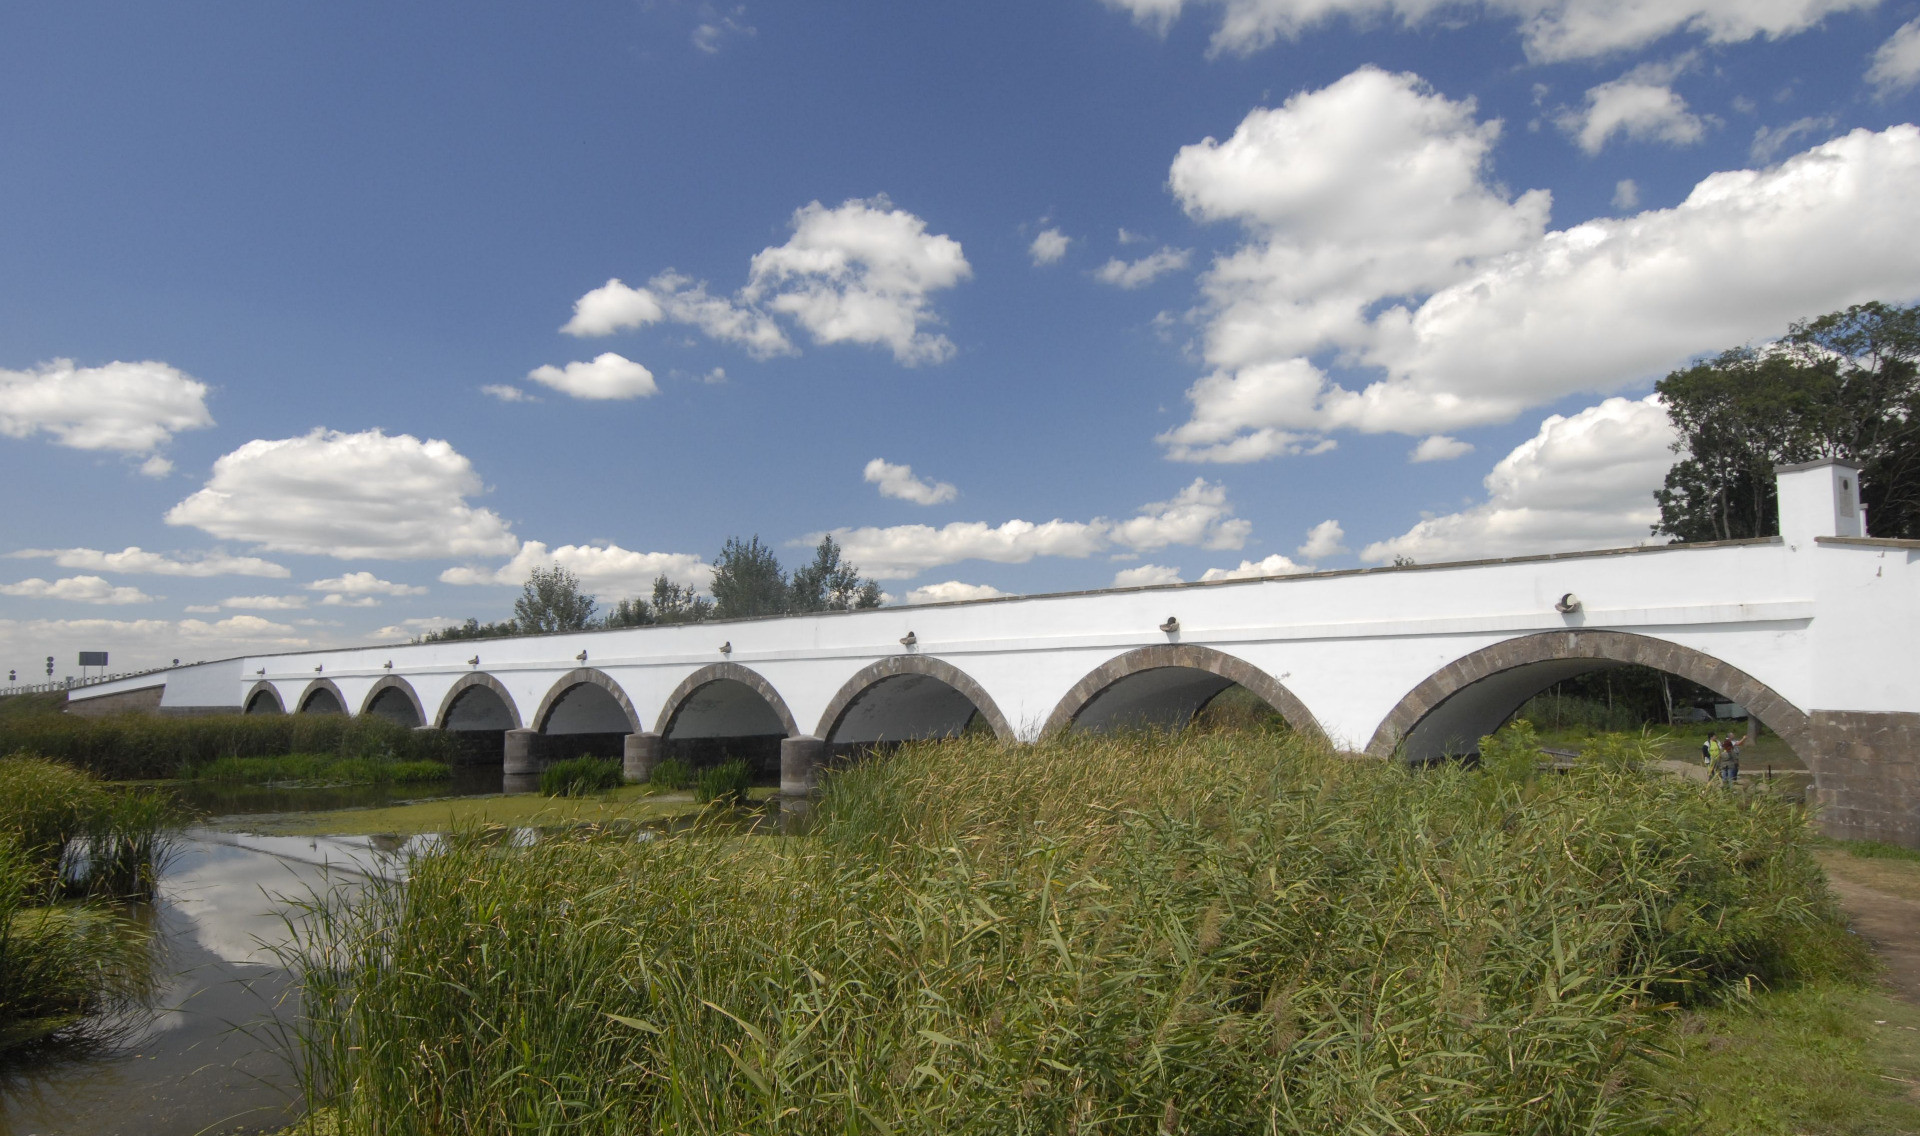 Nine Holed Bridge